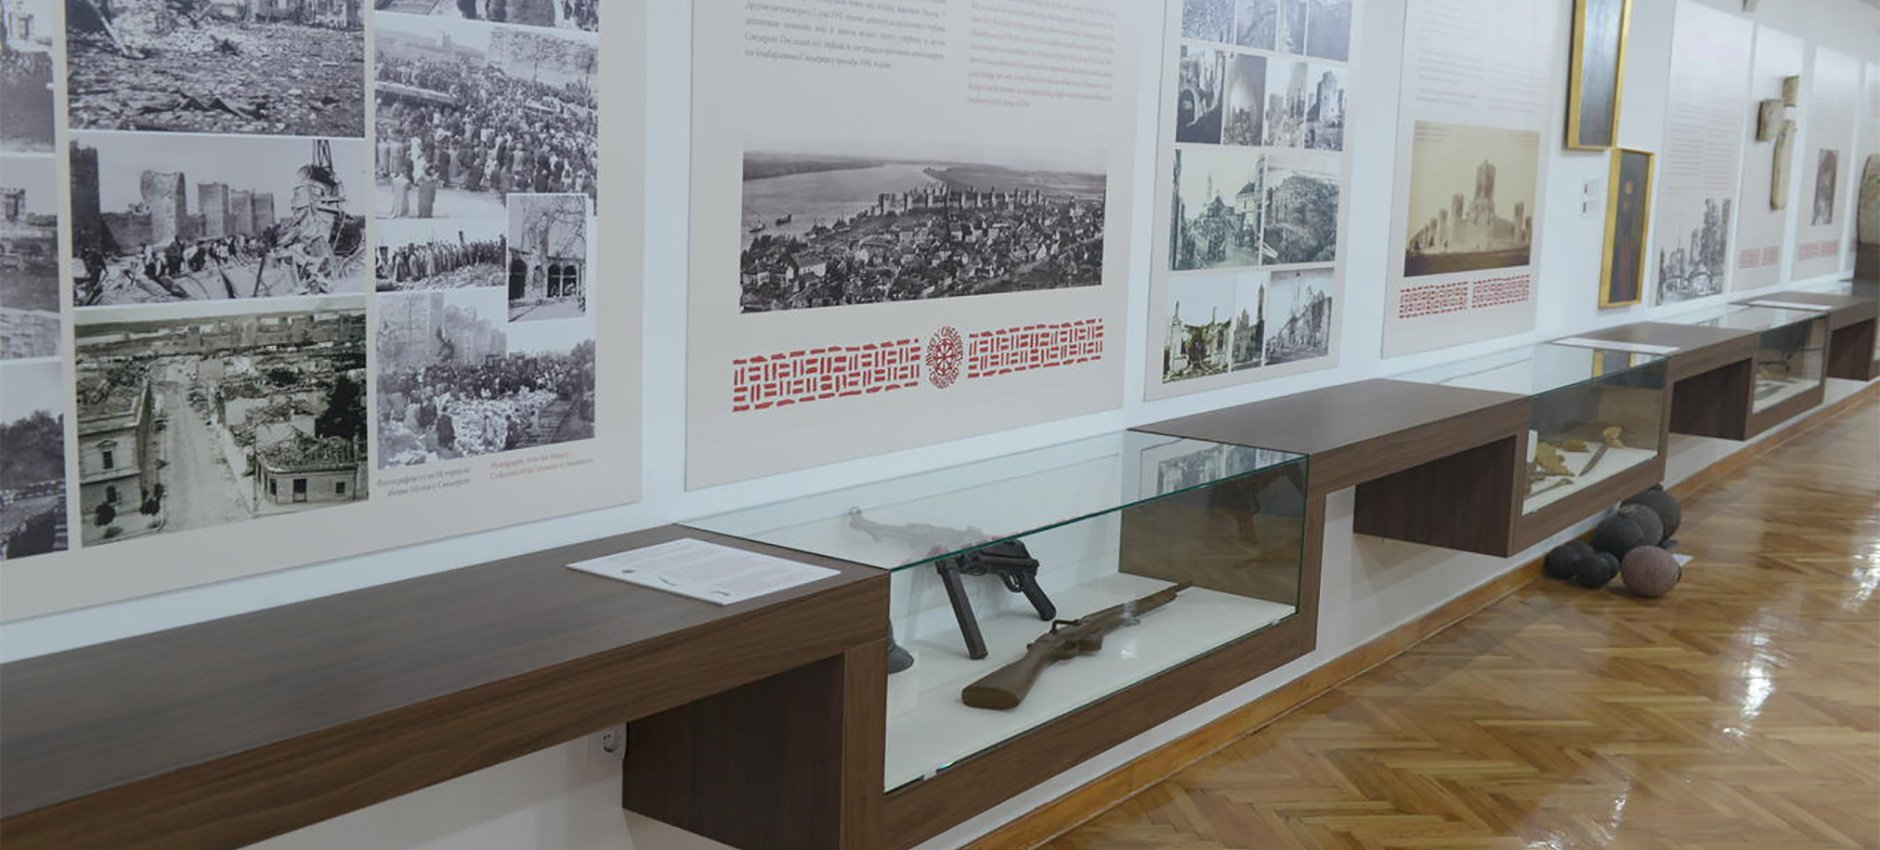 smederevo-muzej-22.jpg